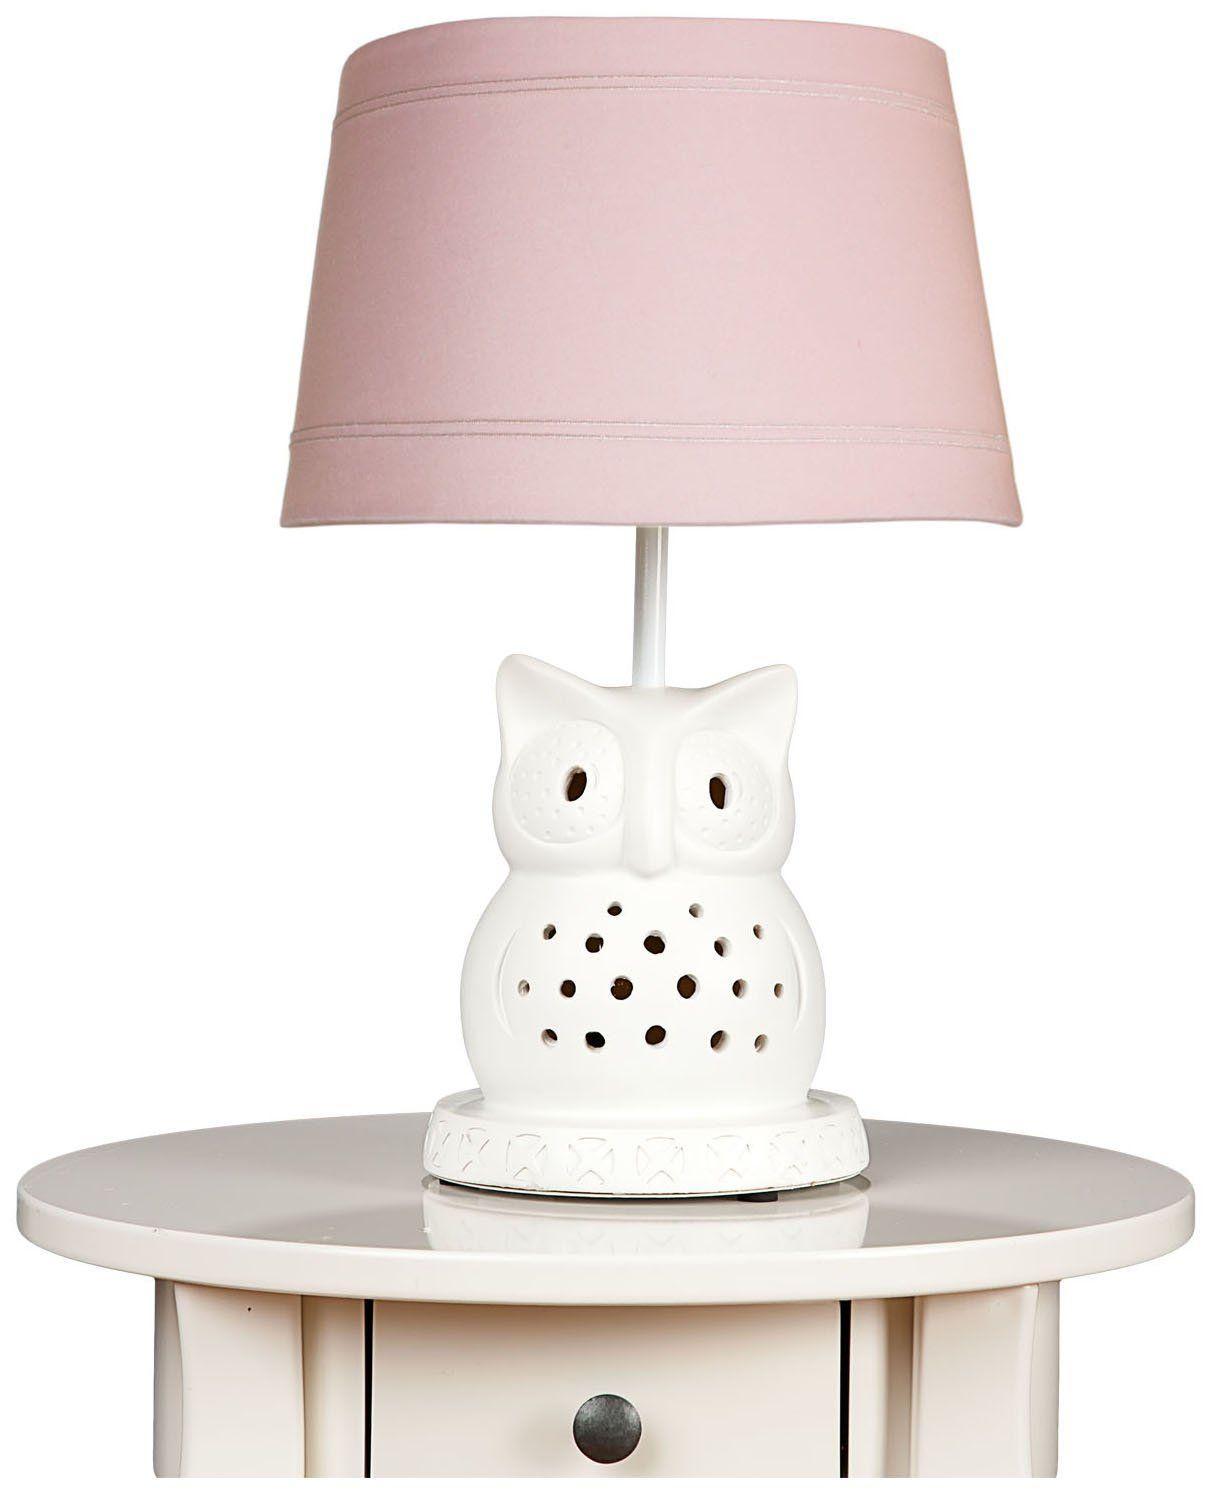 Lolli Living Lamp Base   Owl   Casa.com